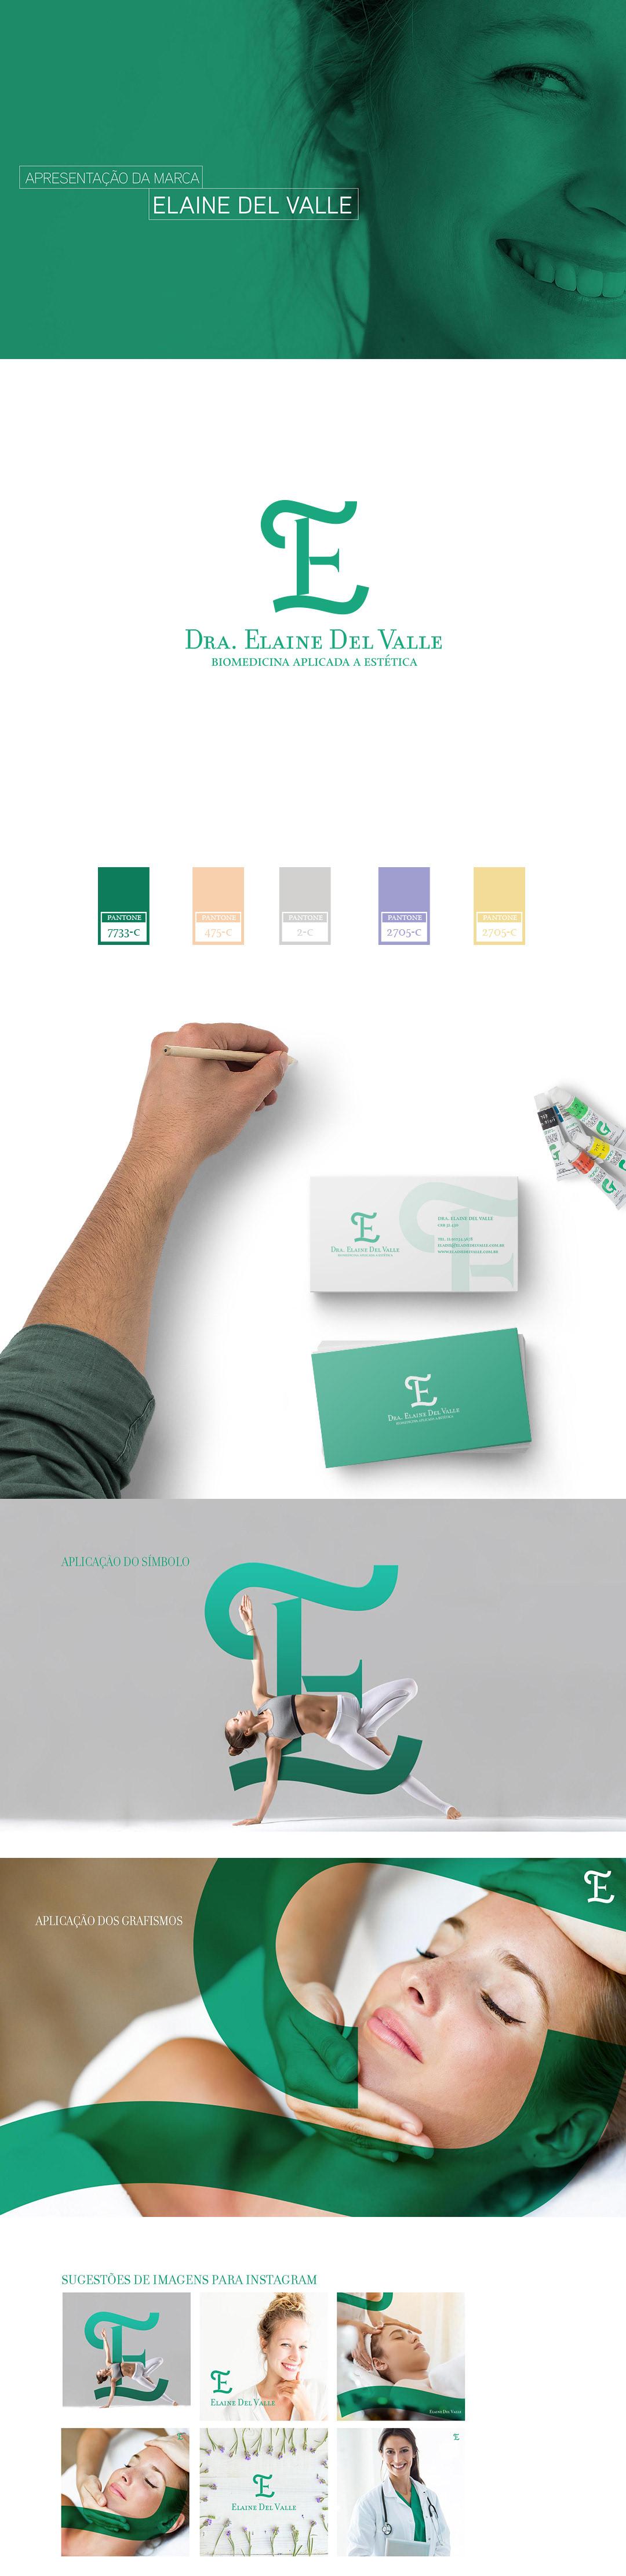 branding ,design,estética,beleza,medicina,identidade visual,design gráfico,graphic design